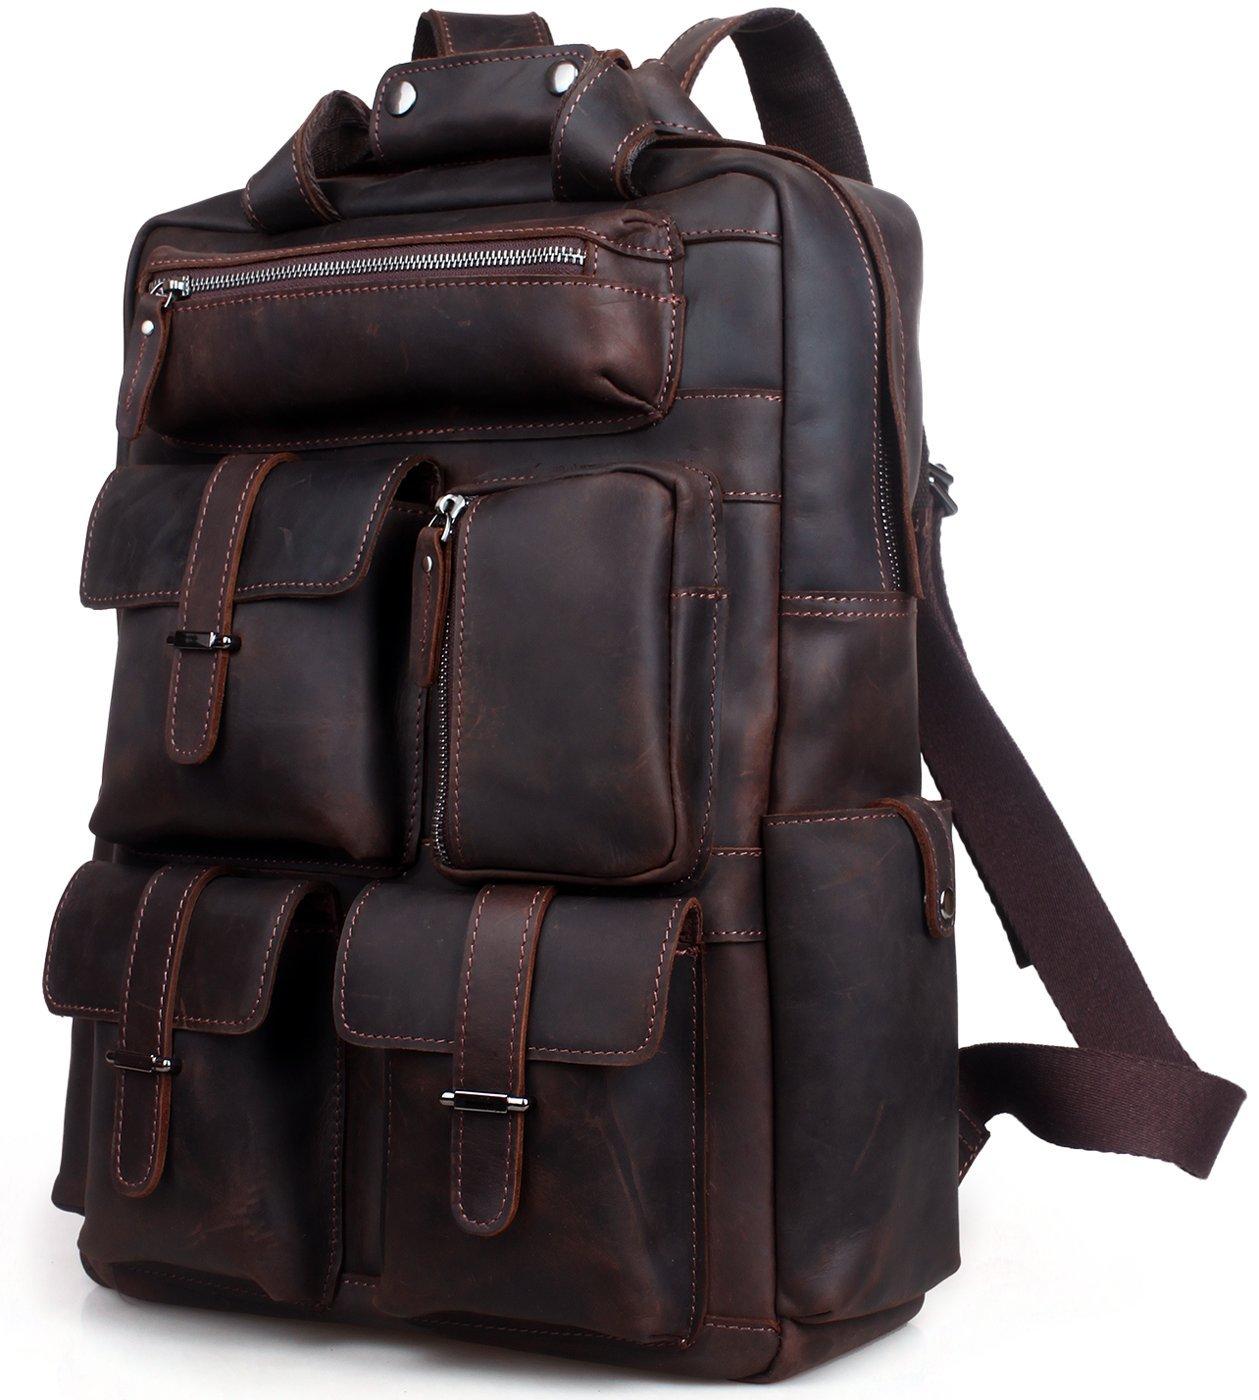 Iswee Vintage Leather Backpack Multi Pockets 17' Laptop Case Daypack Travel Sports Bag For Men (Dark Brown)